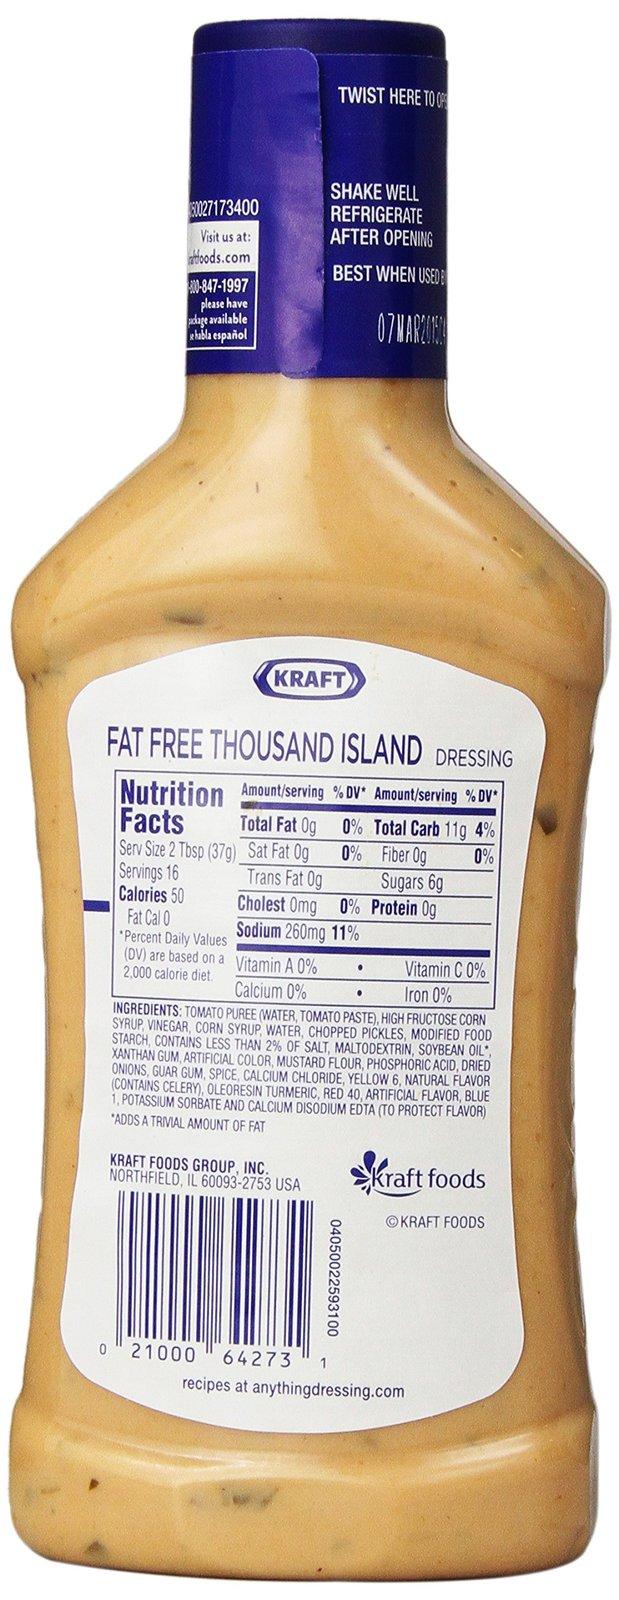 Kraft Fat Free Thousand Island 16 Oz And 34 Similar Items